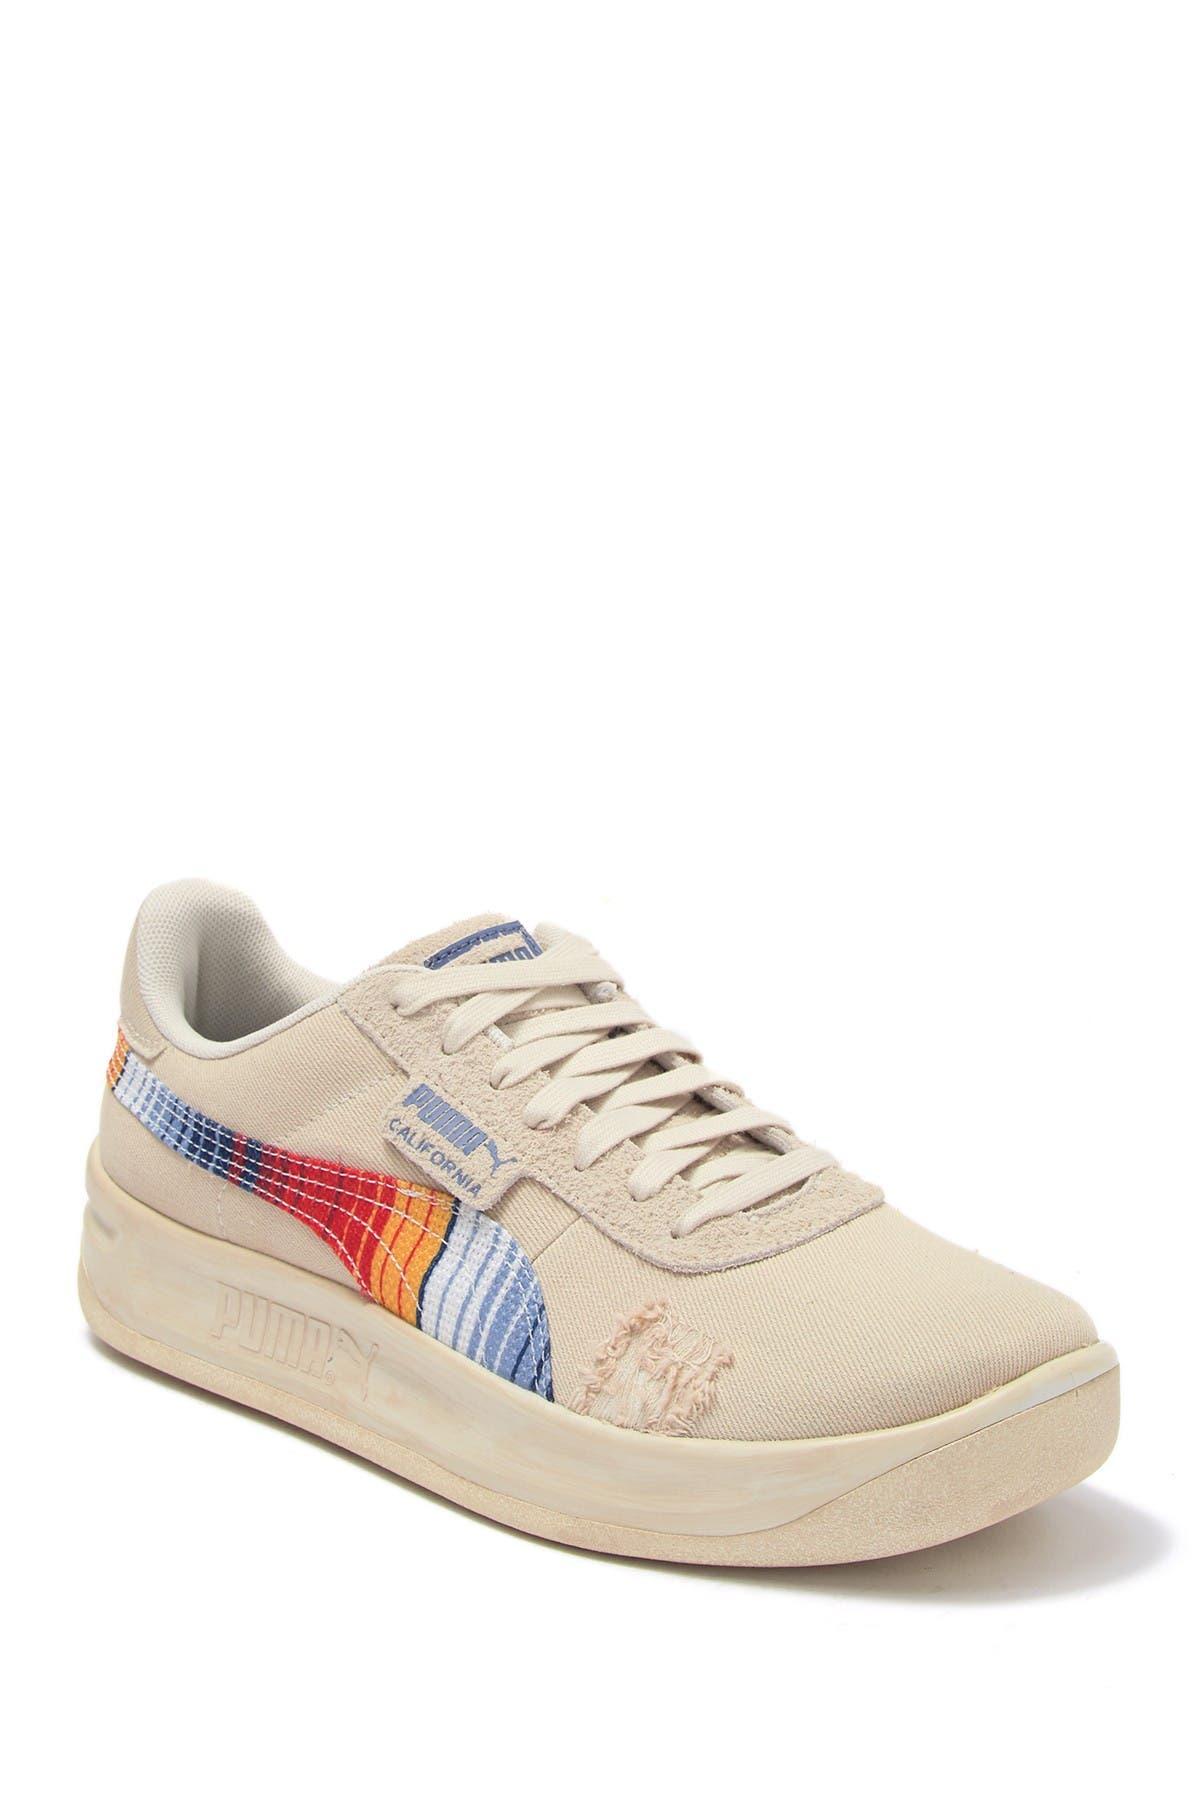 PUMA | California Vintage Sneaker